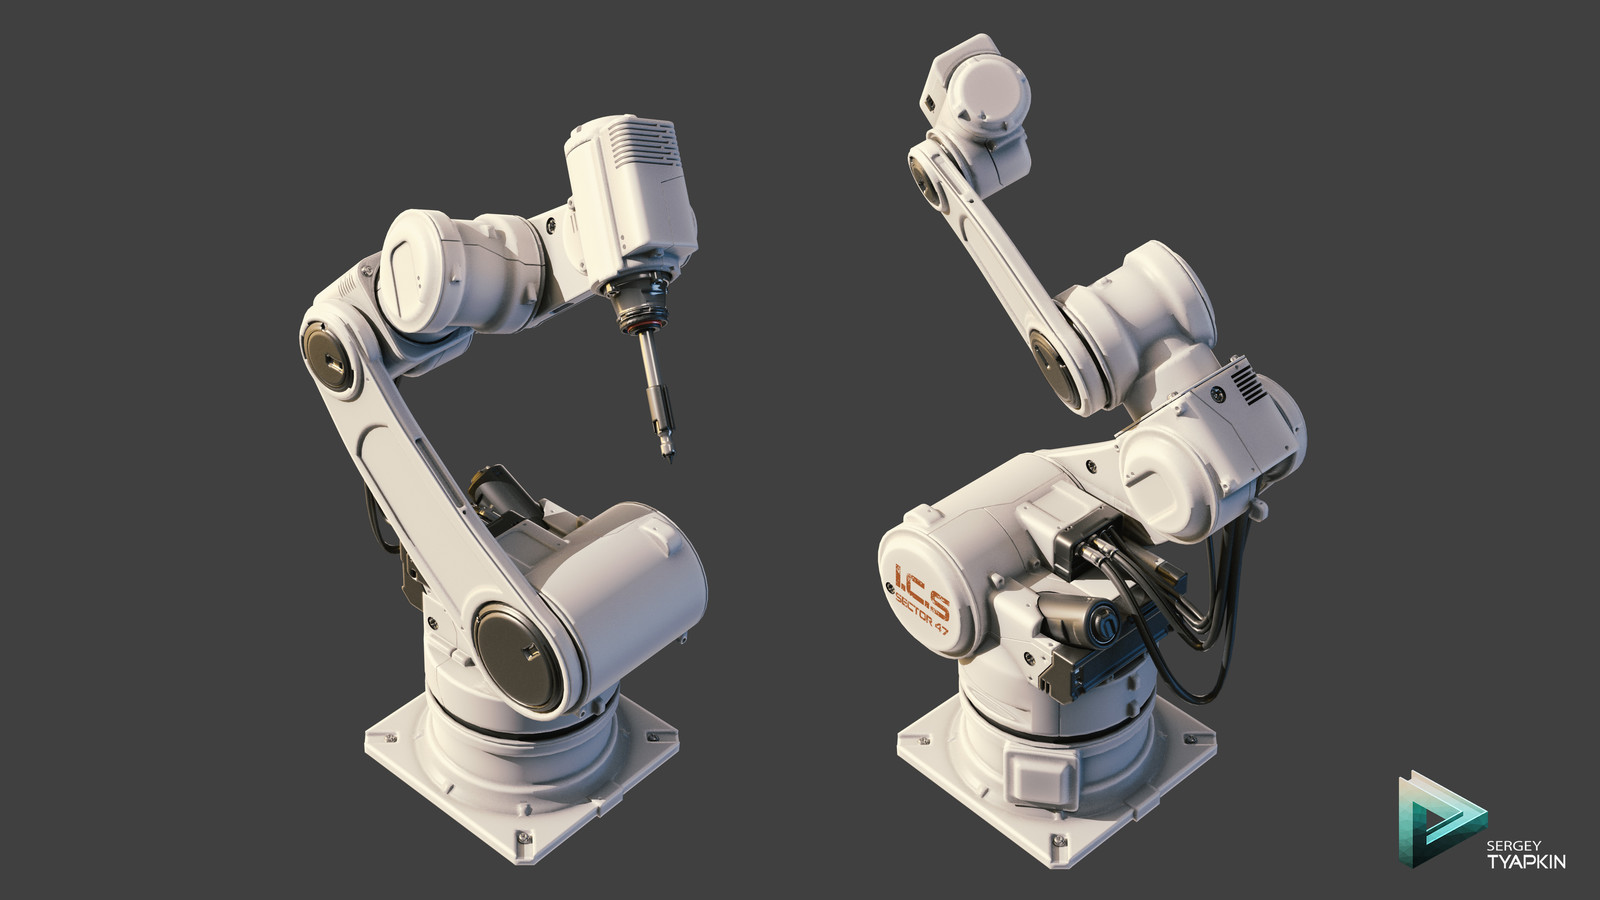 Day 9. Robotic arm